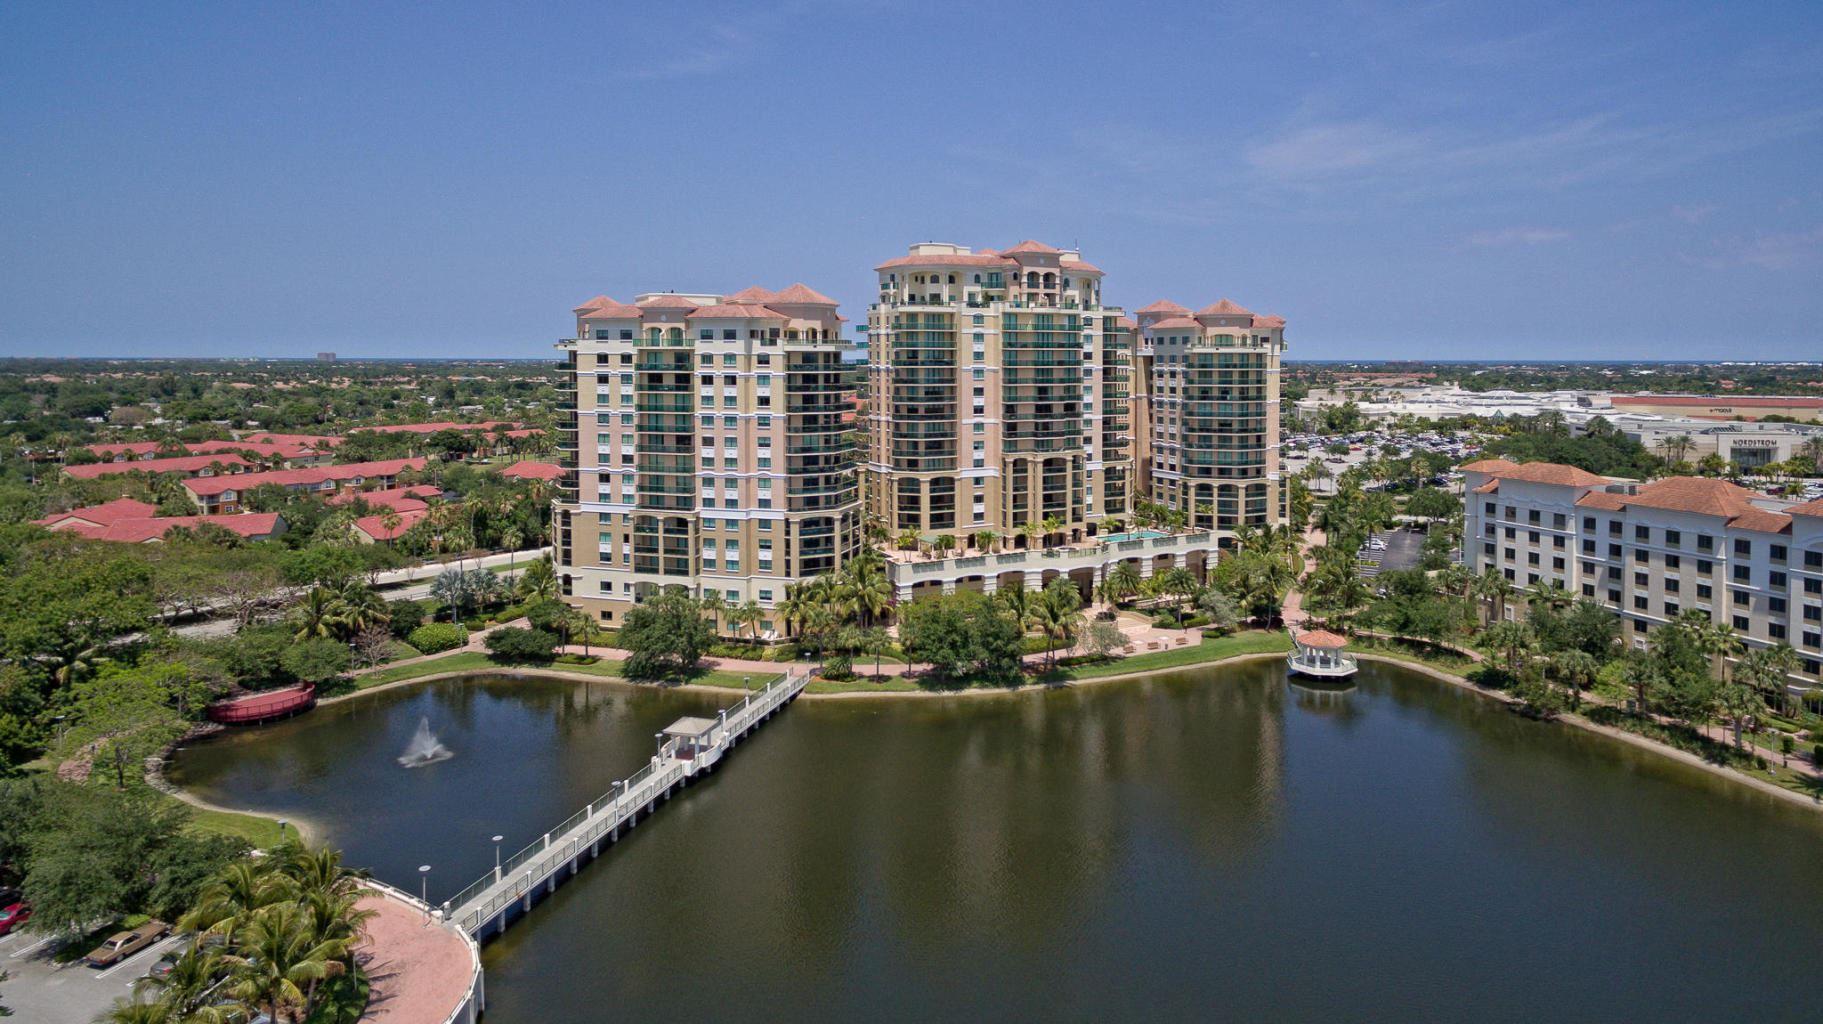 3610 Gardens Parkway #405a, Palm Beach Gardens, FL 33410 - #: RX-10606109